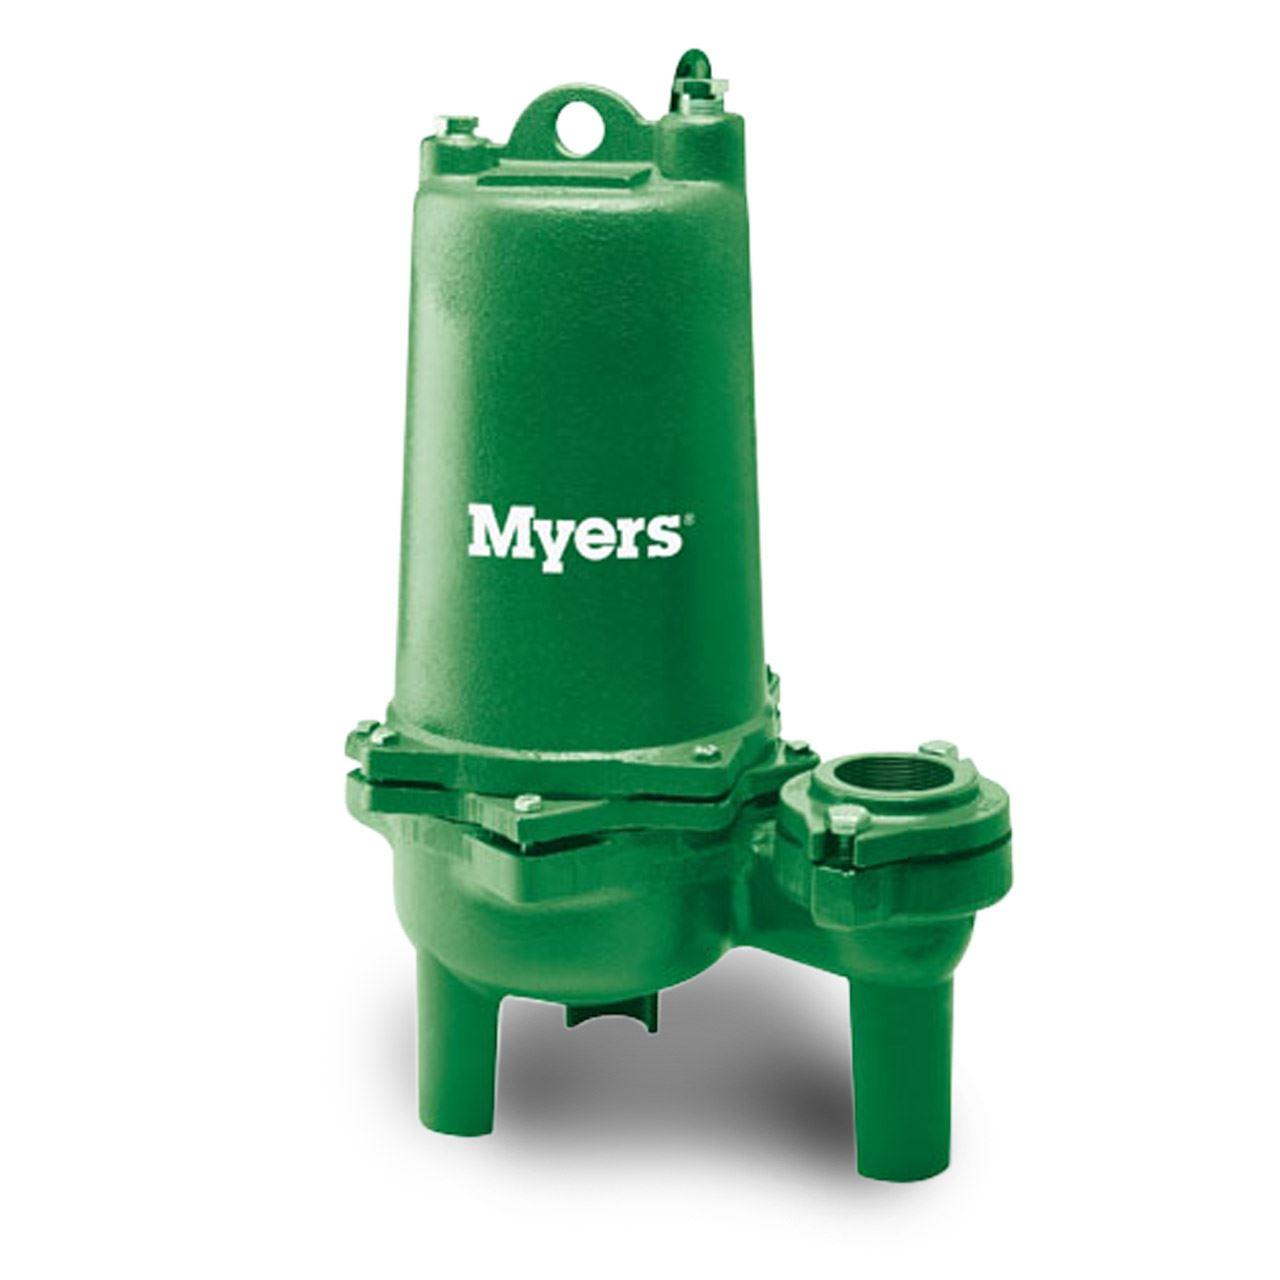 myers grinder pump wiring diagram wiring diagrams schematics rh gadgetlocker co Dual Float Switch Wiring Diagram Sewage Pump Float Wiring Diagram 3